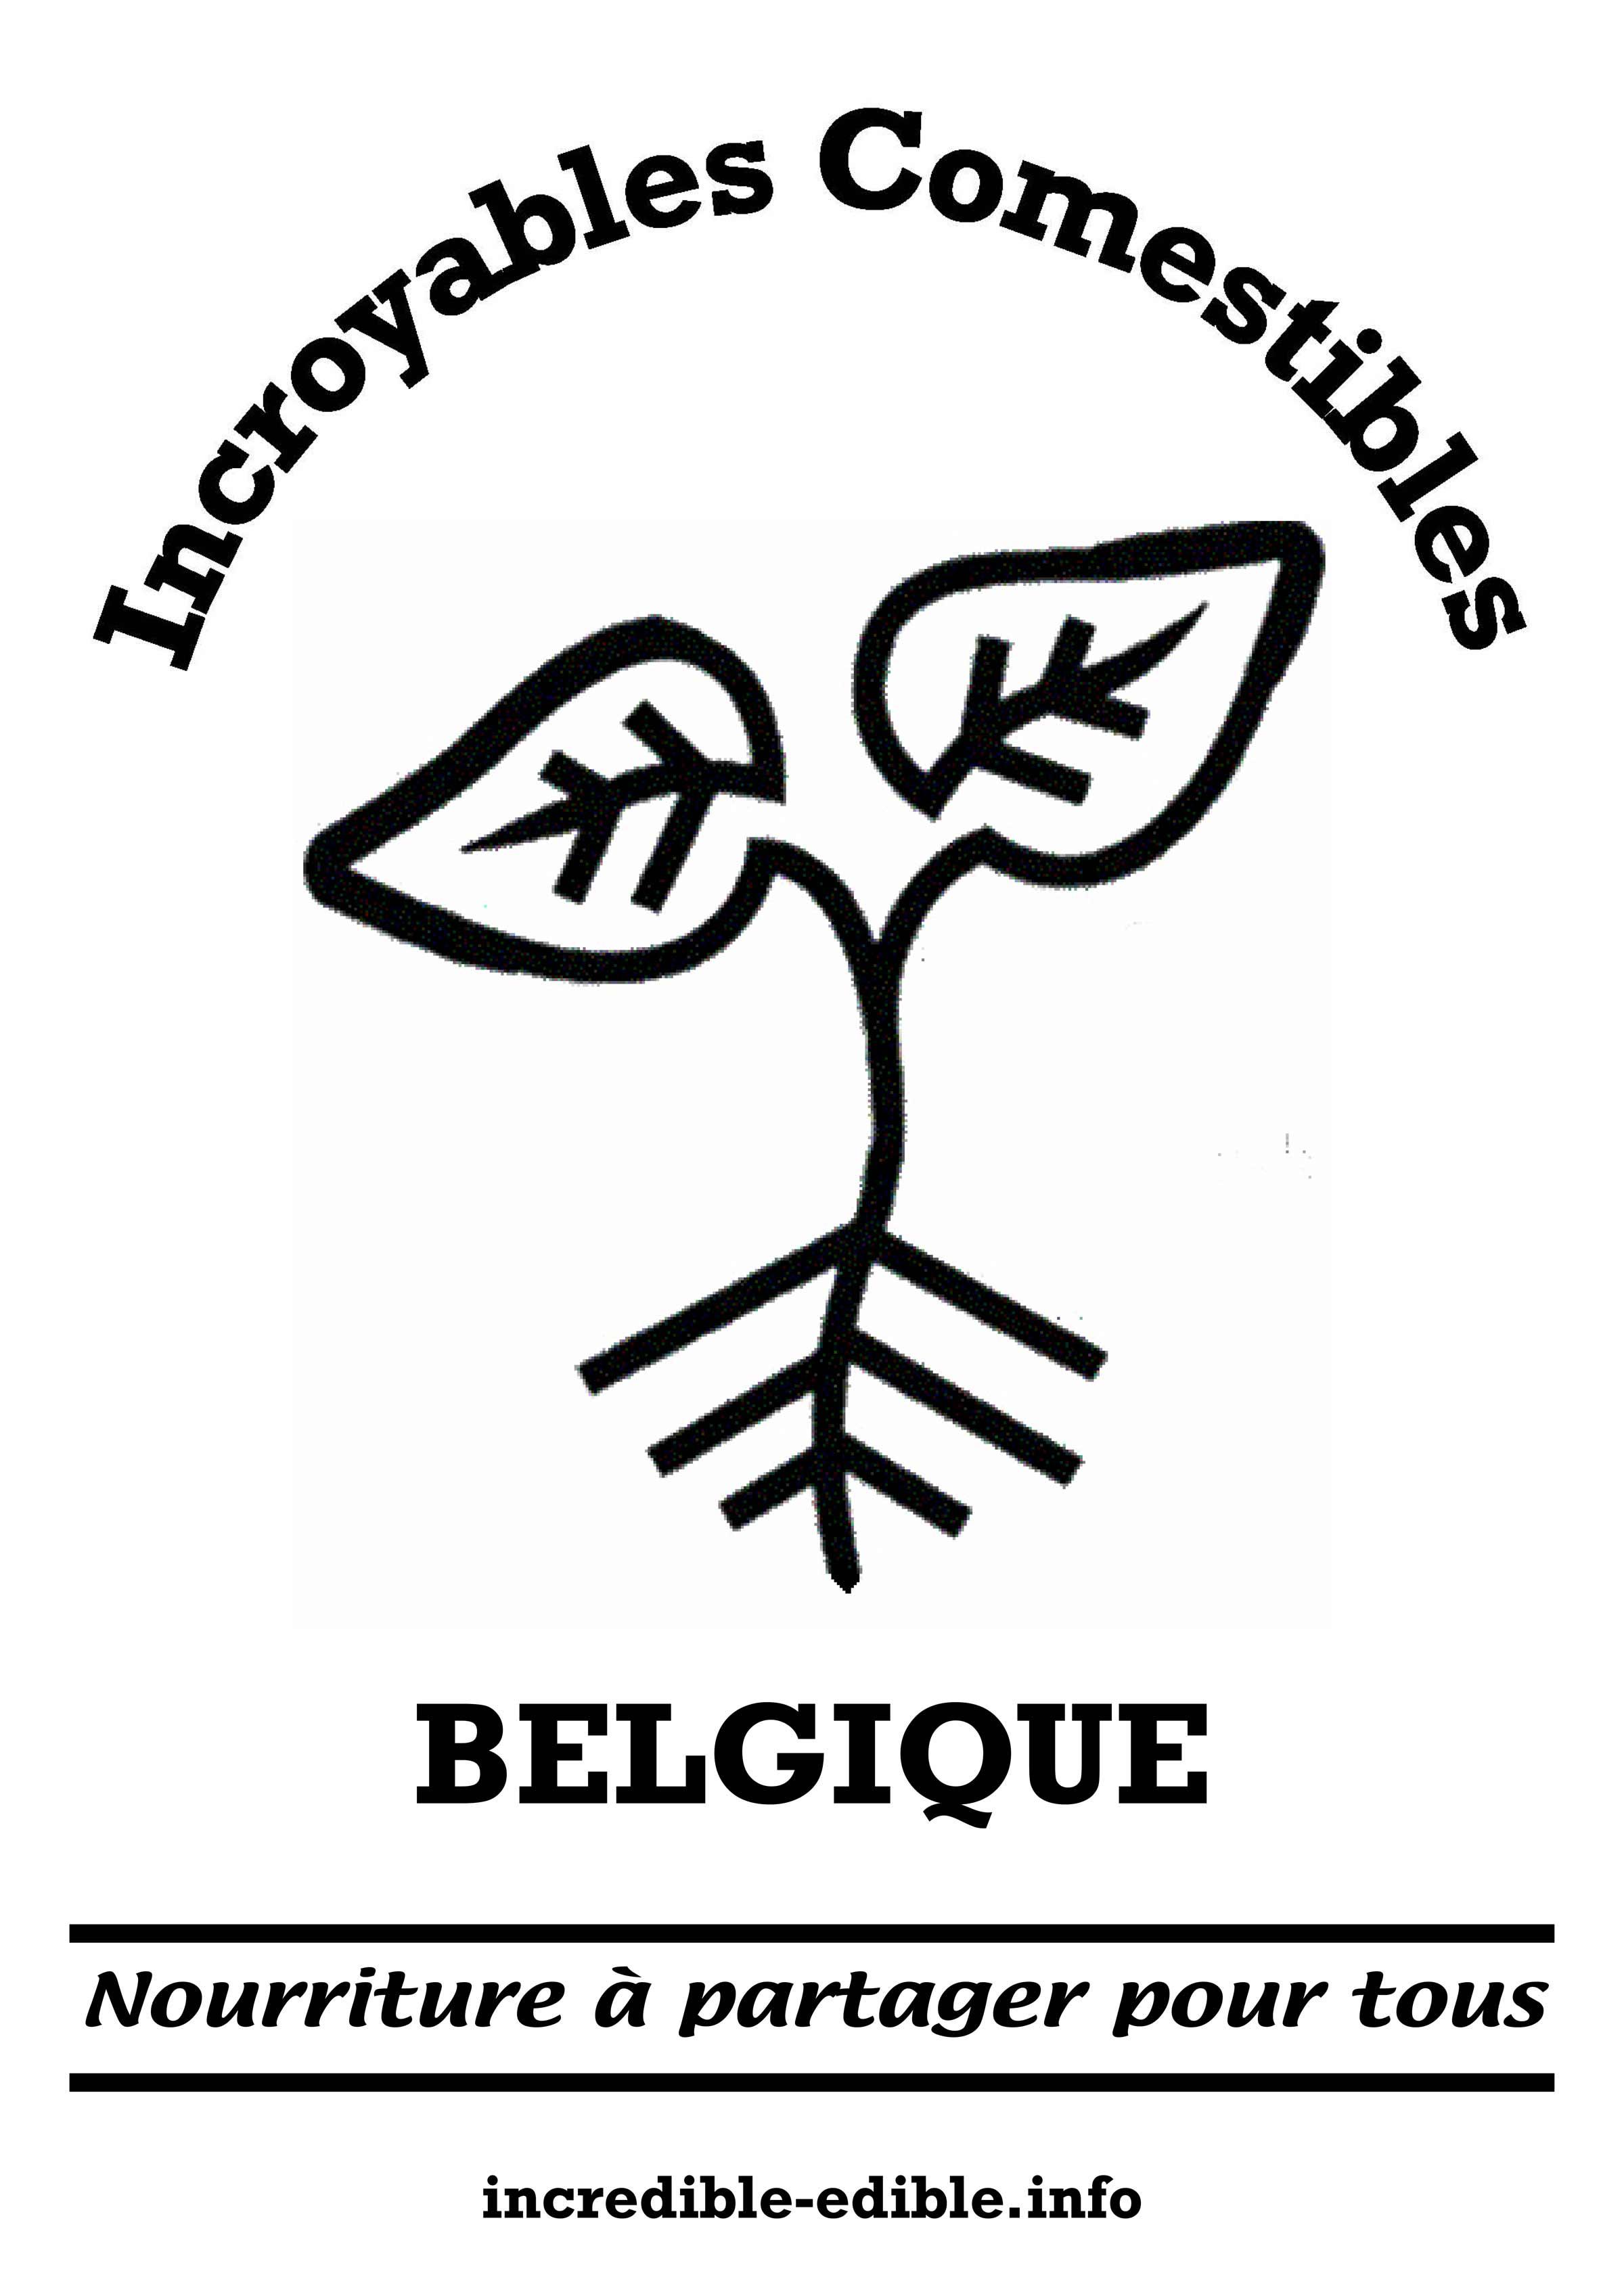 Logo Incroyables Comestibles Belgique